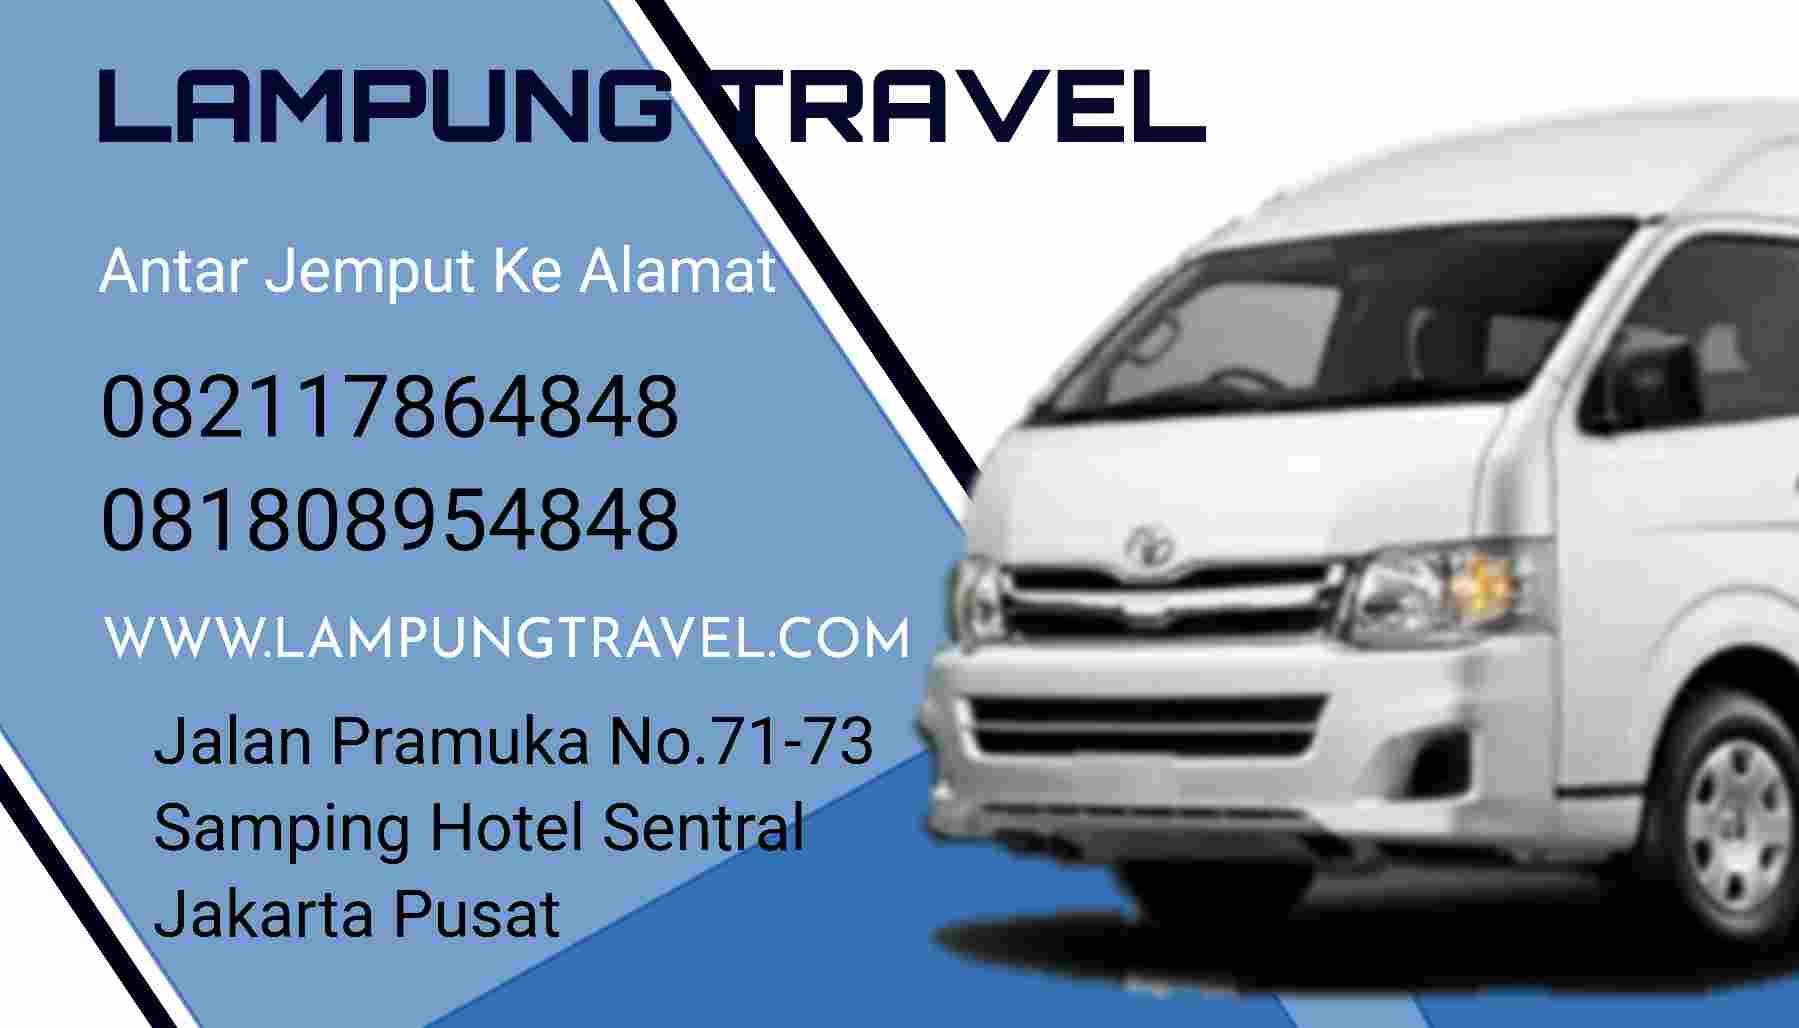 Travel Bekasi Pringsewu Tanjung Karang Lampung